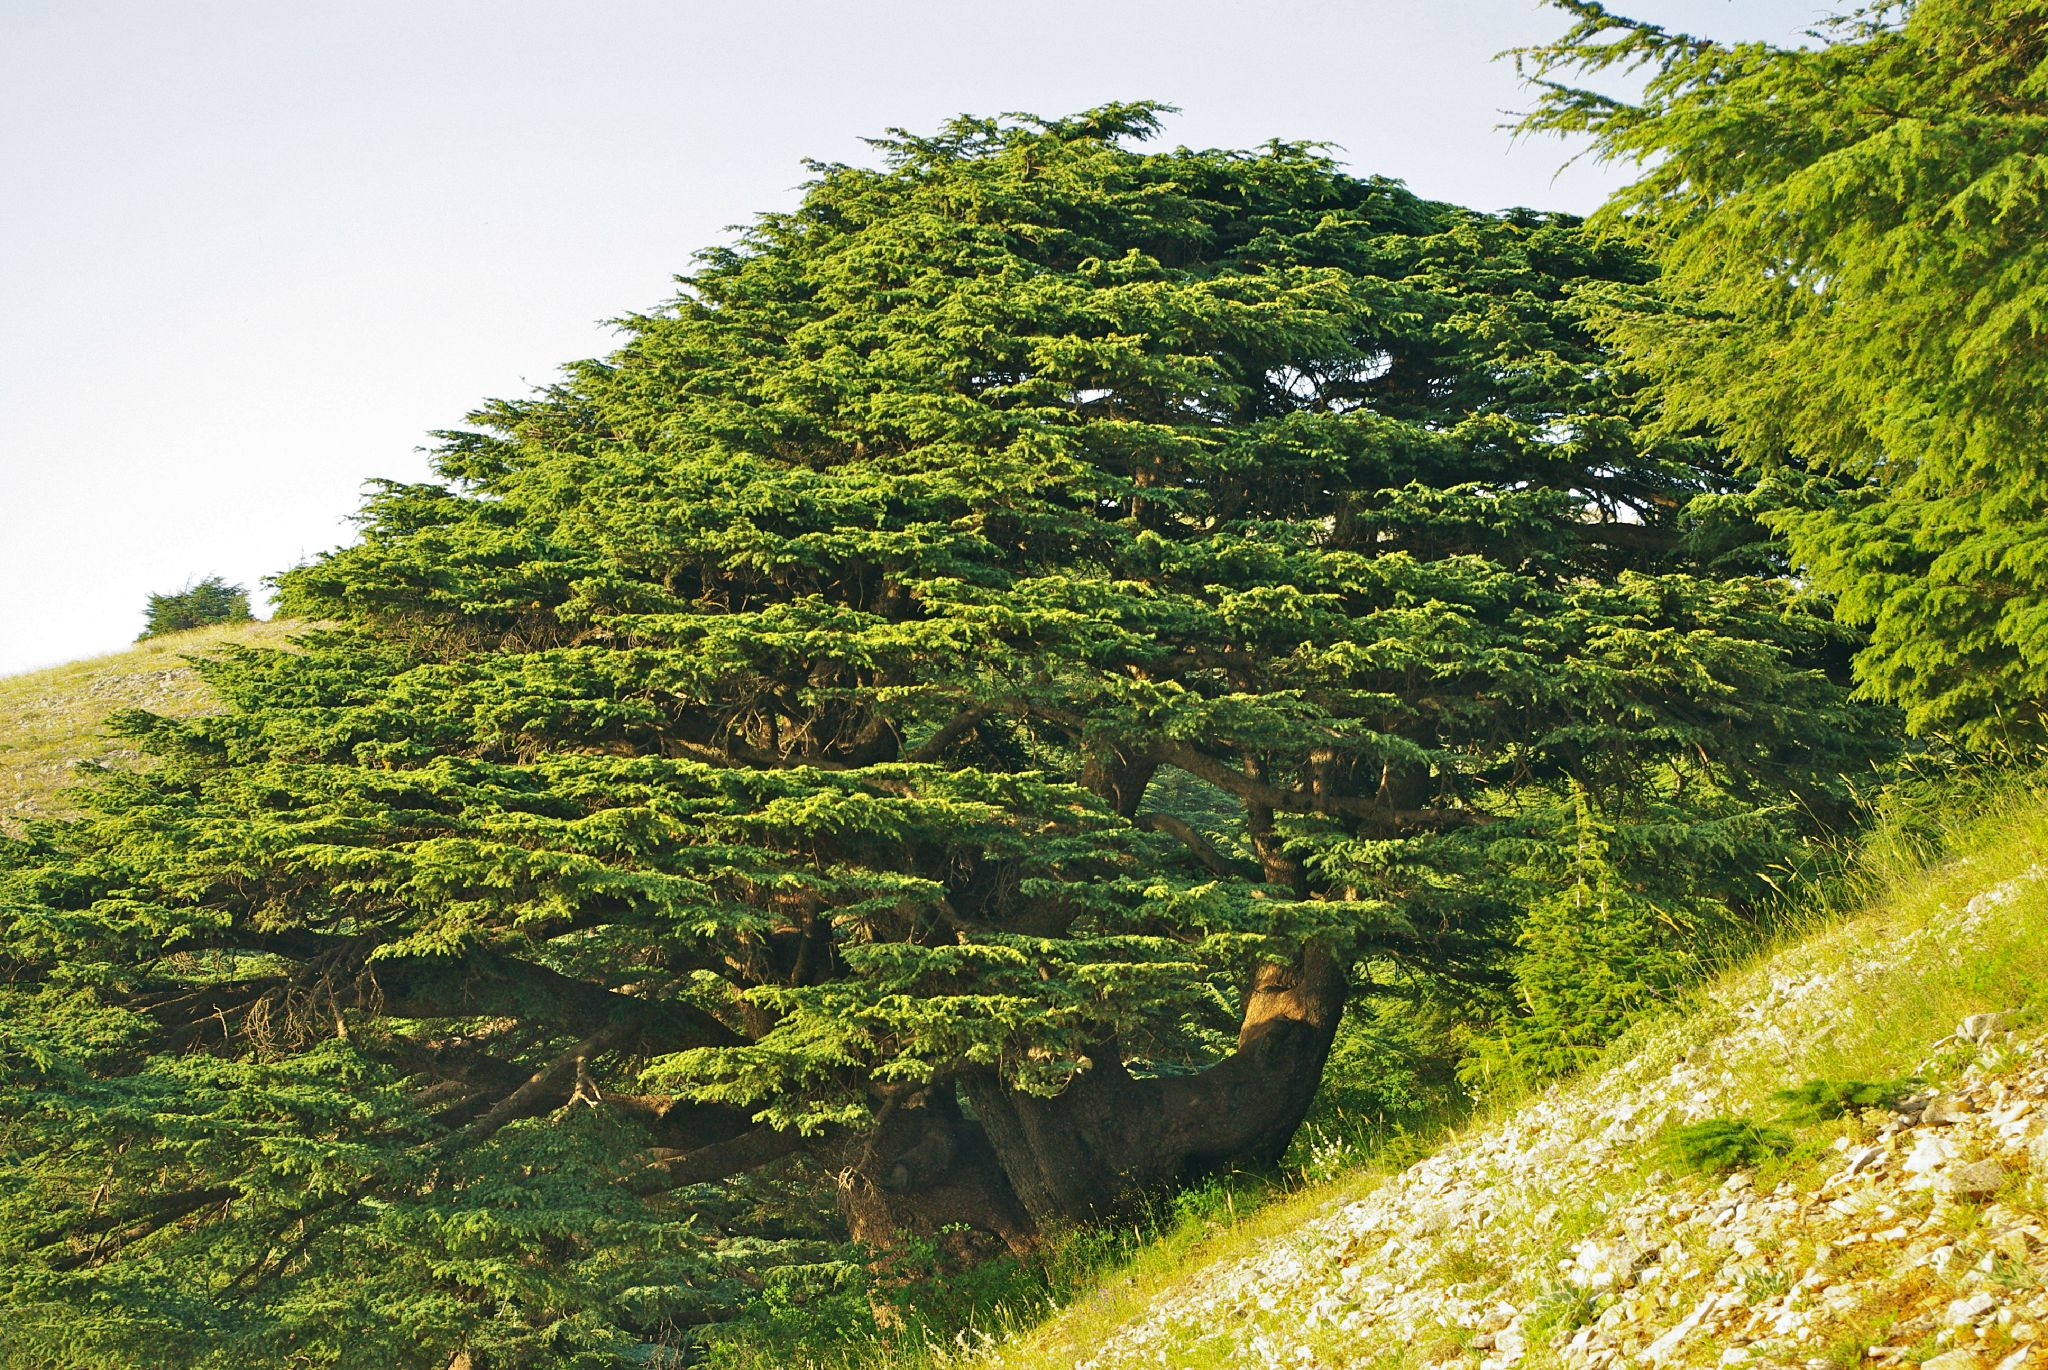 Impressions du liban 5 les c dres alter et ego carnet - Cedre bleu du liban ...